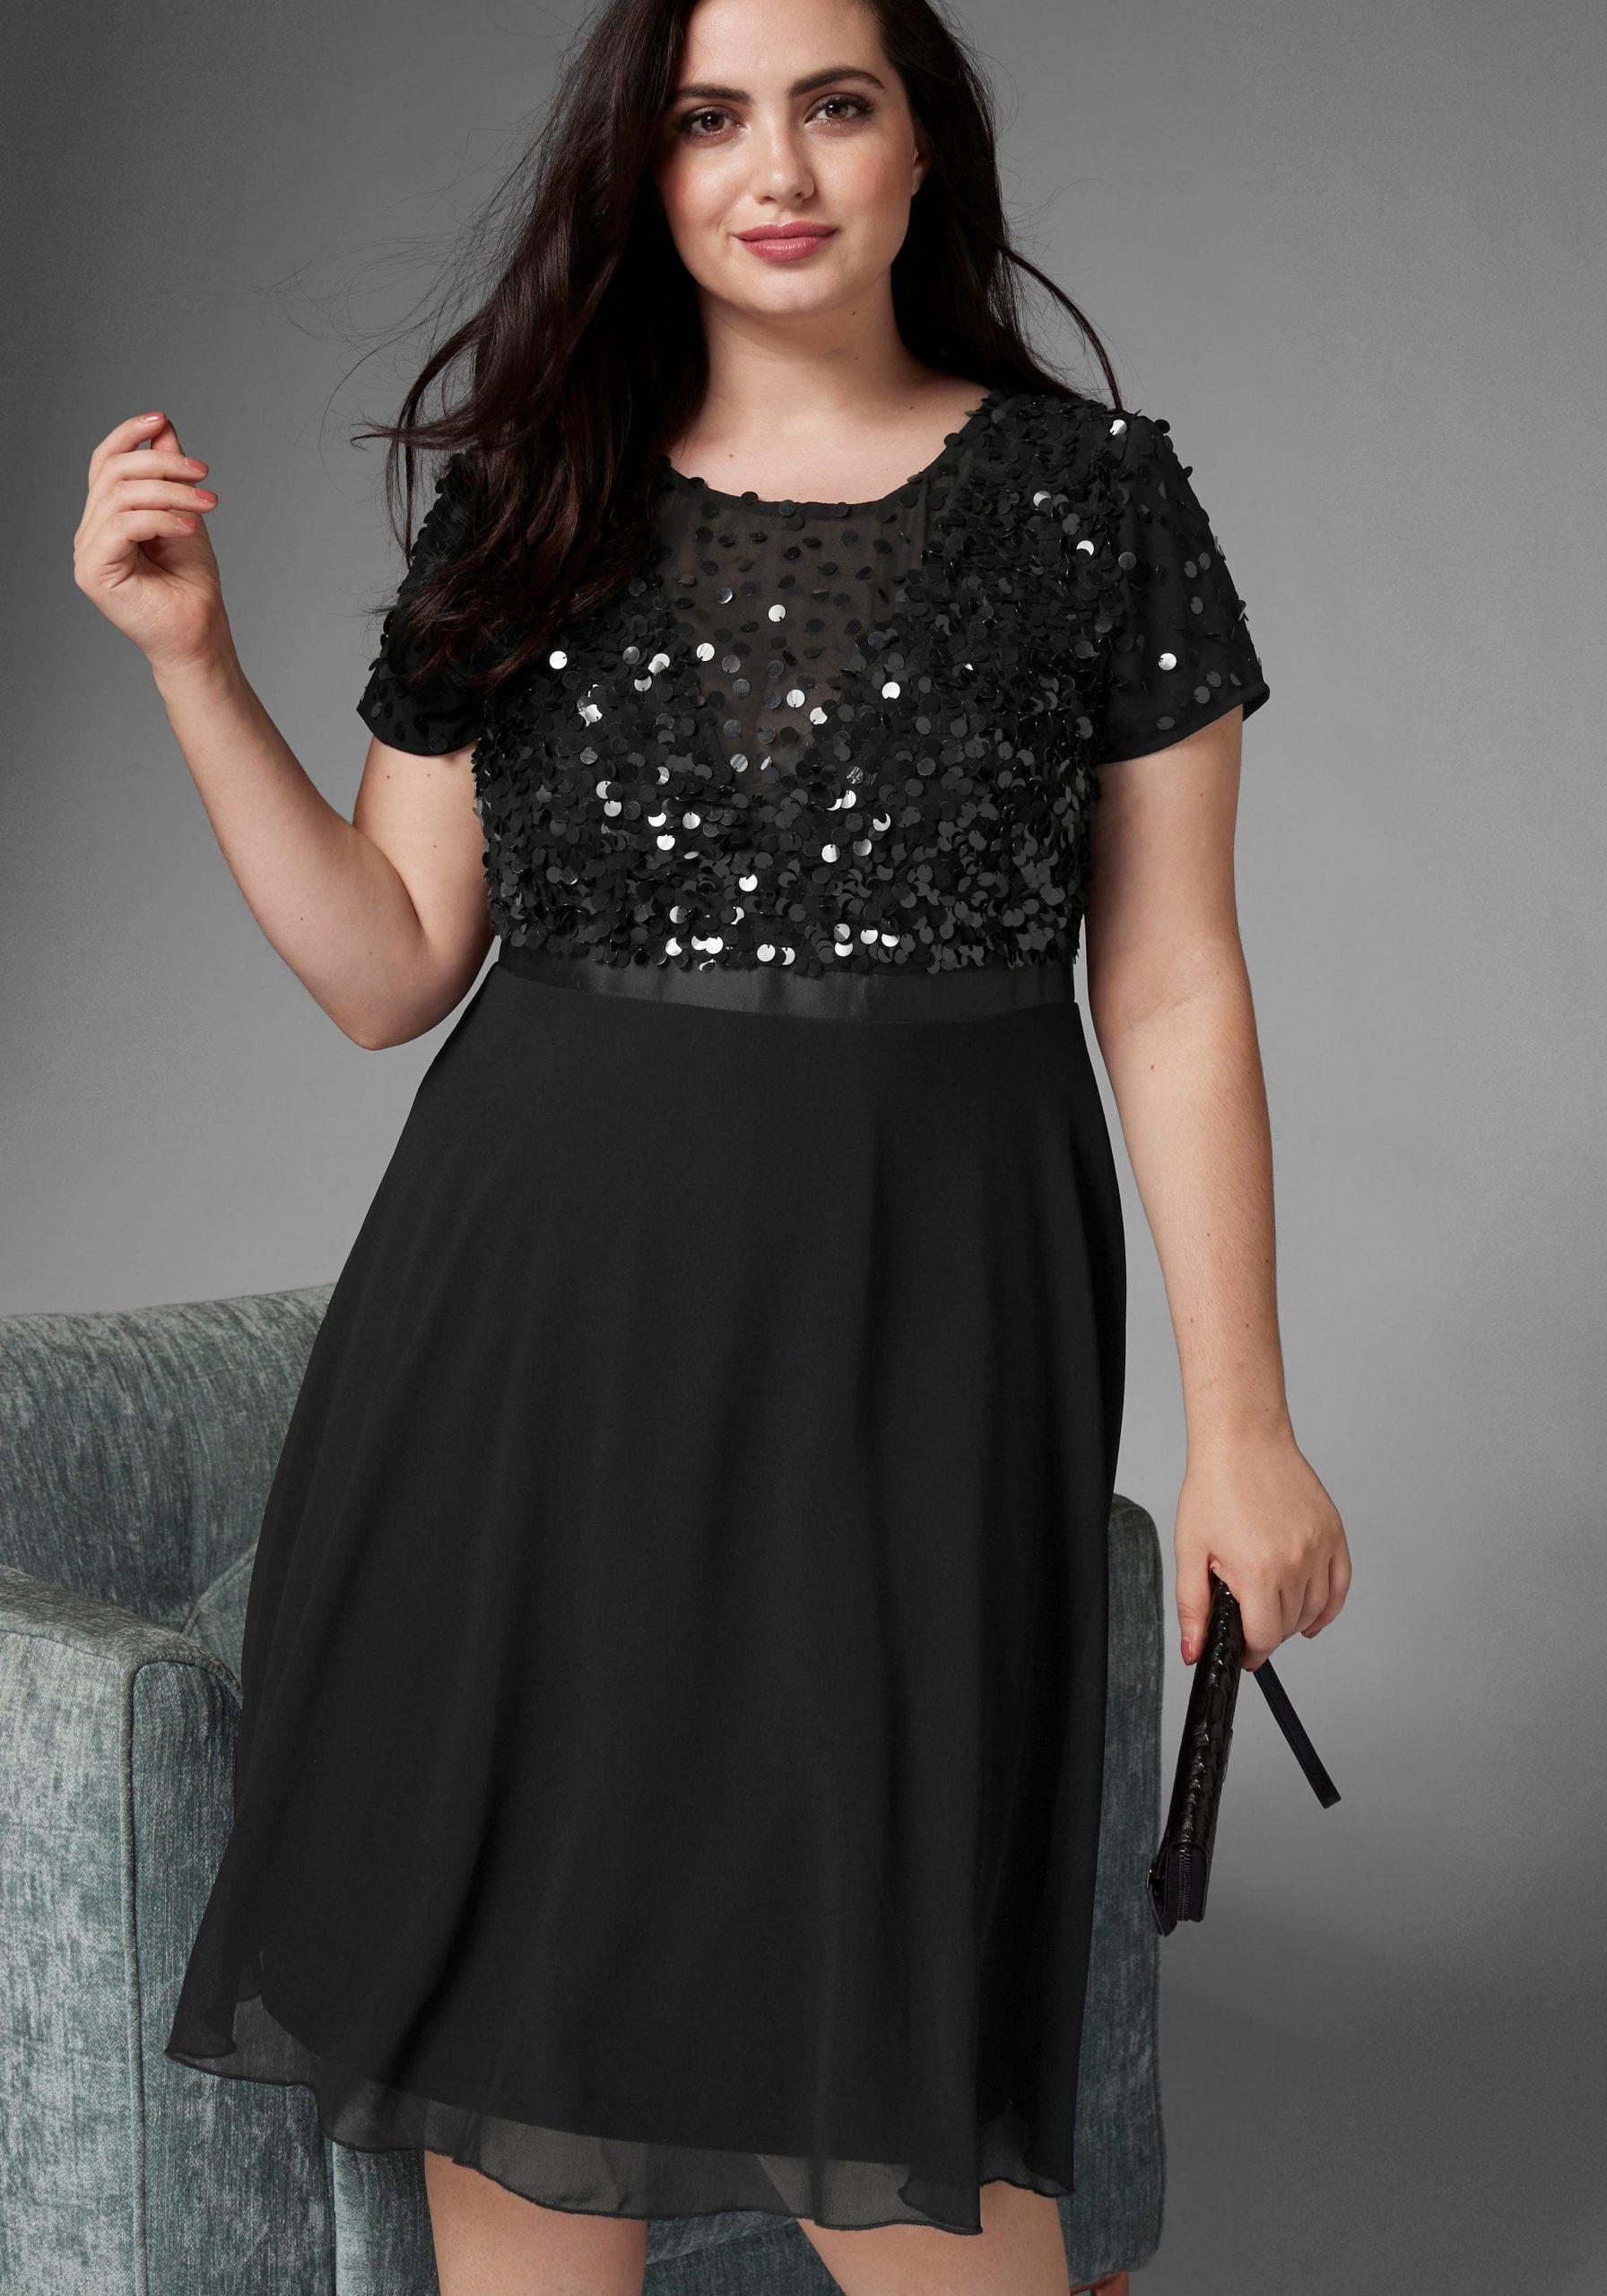 10 Spektakulär Abendkleid Curvy Stylish20 Luxus Abendkleid Curvy Bester Preis